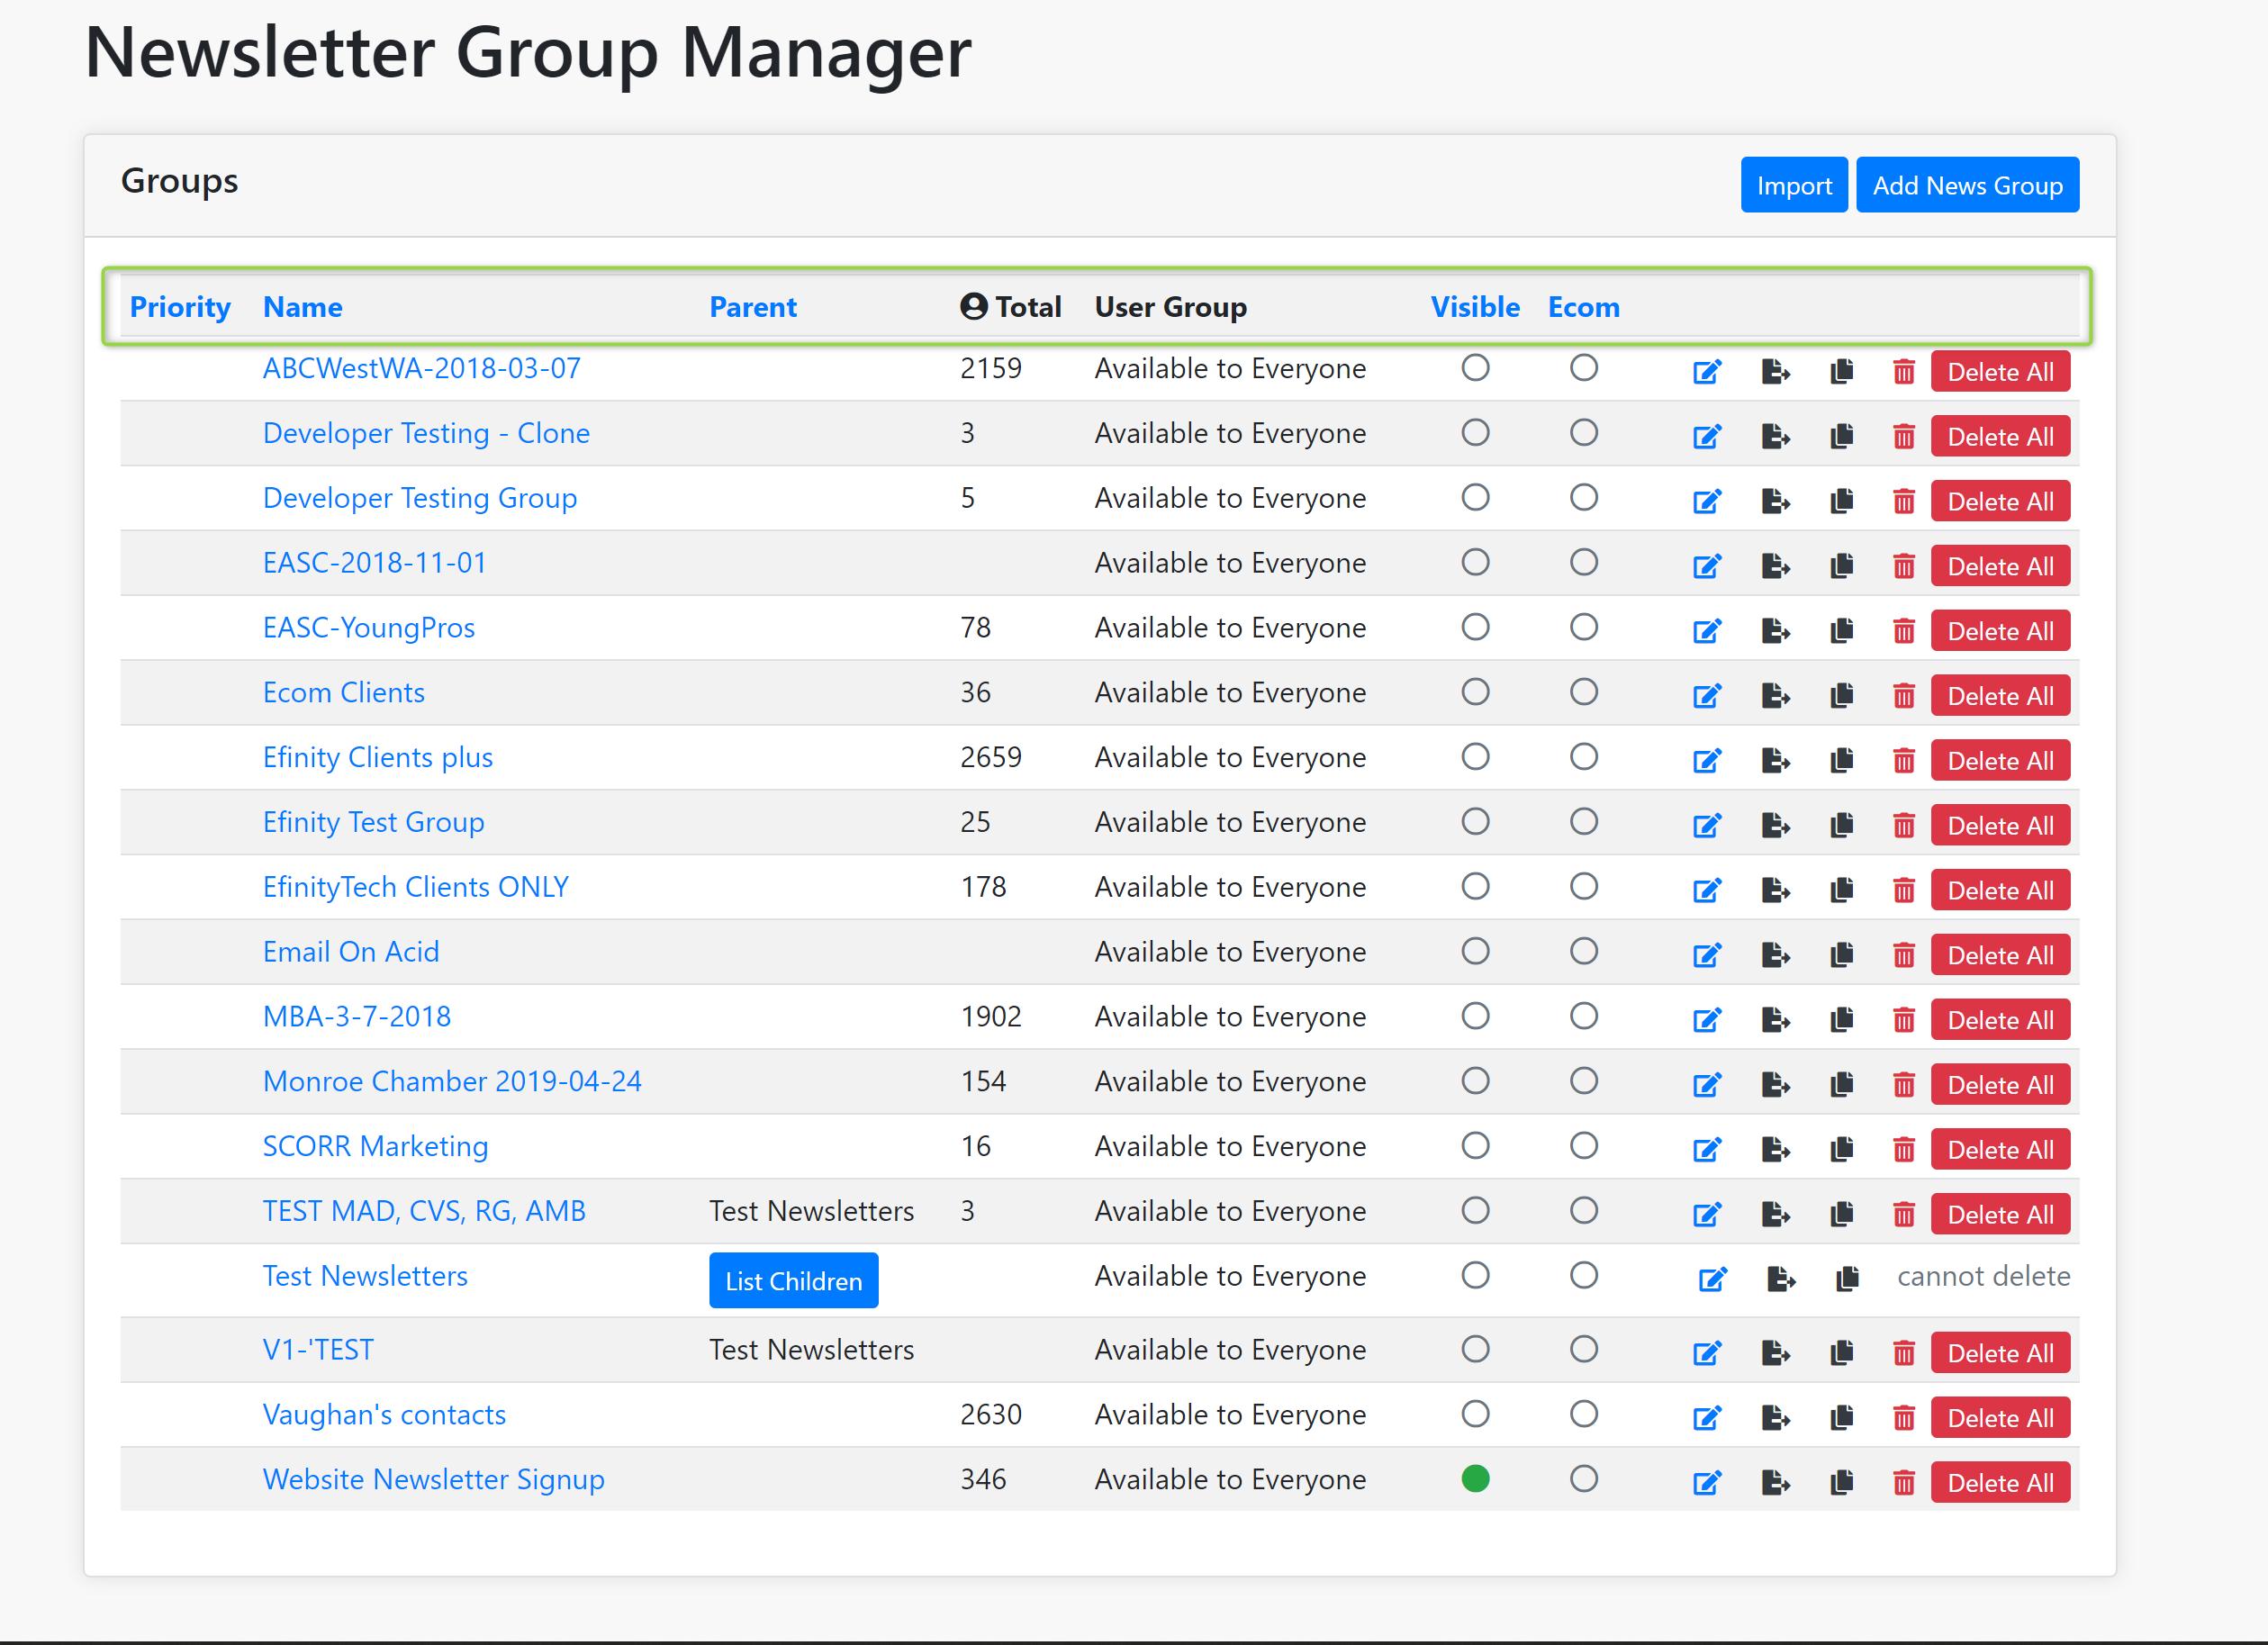 Newsletter Group Manager Information Screenshot